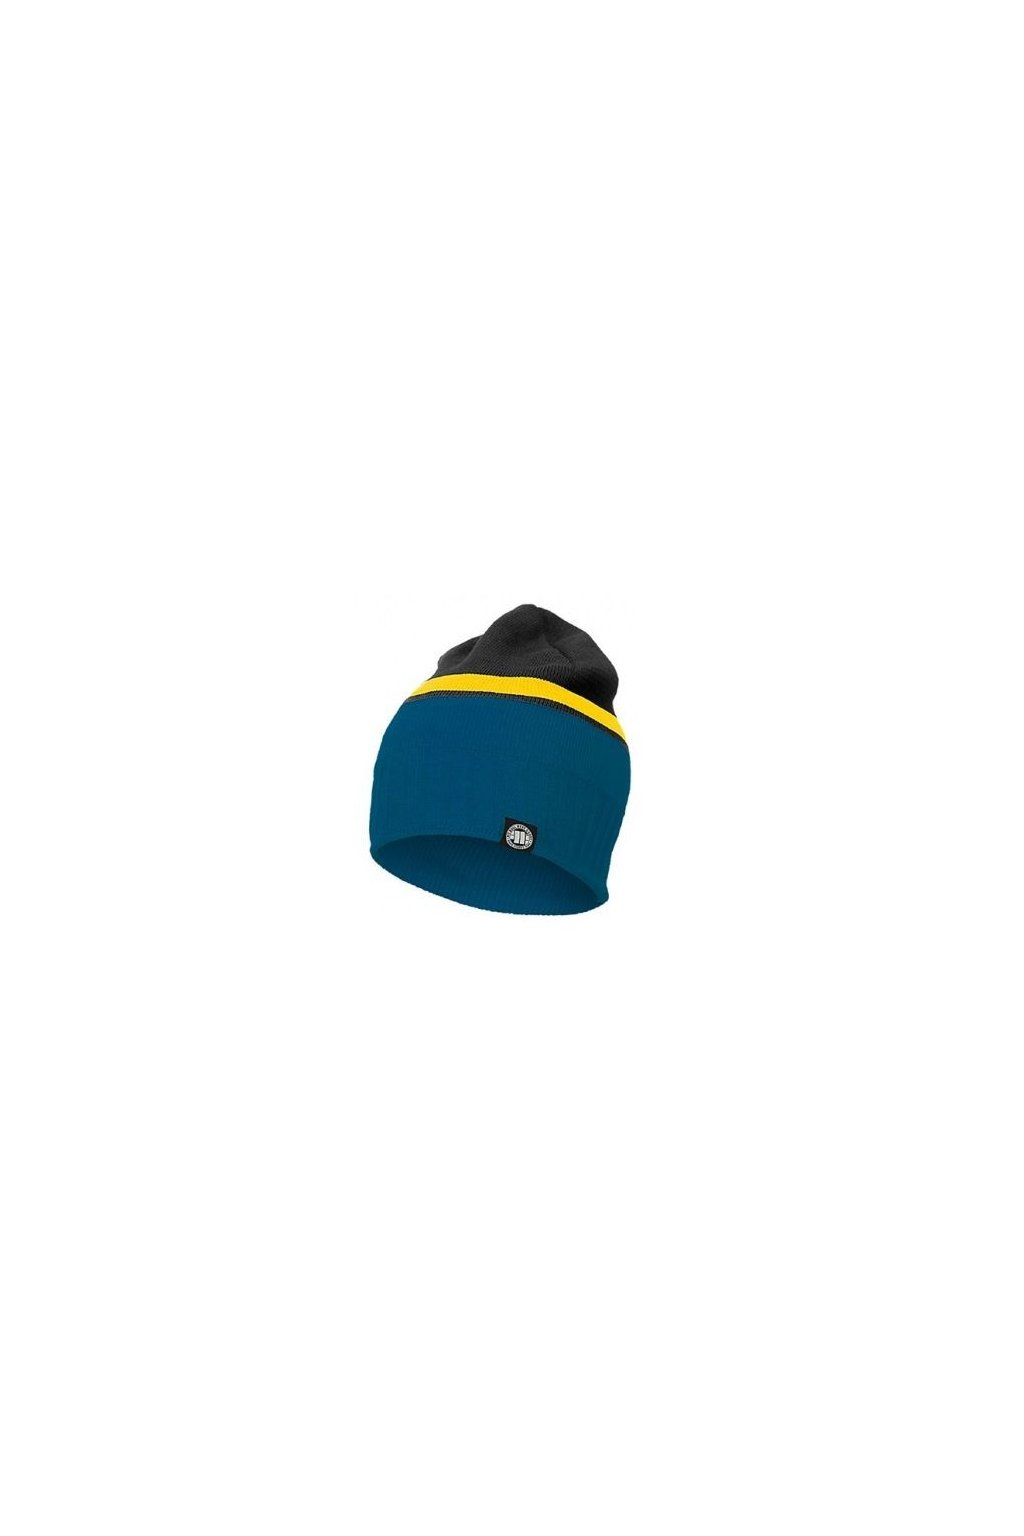 3179 pitbull west coast zimni cepice midway temne modra